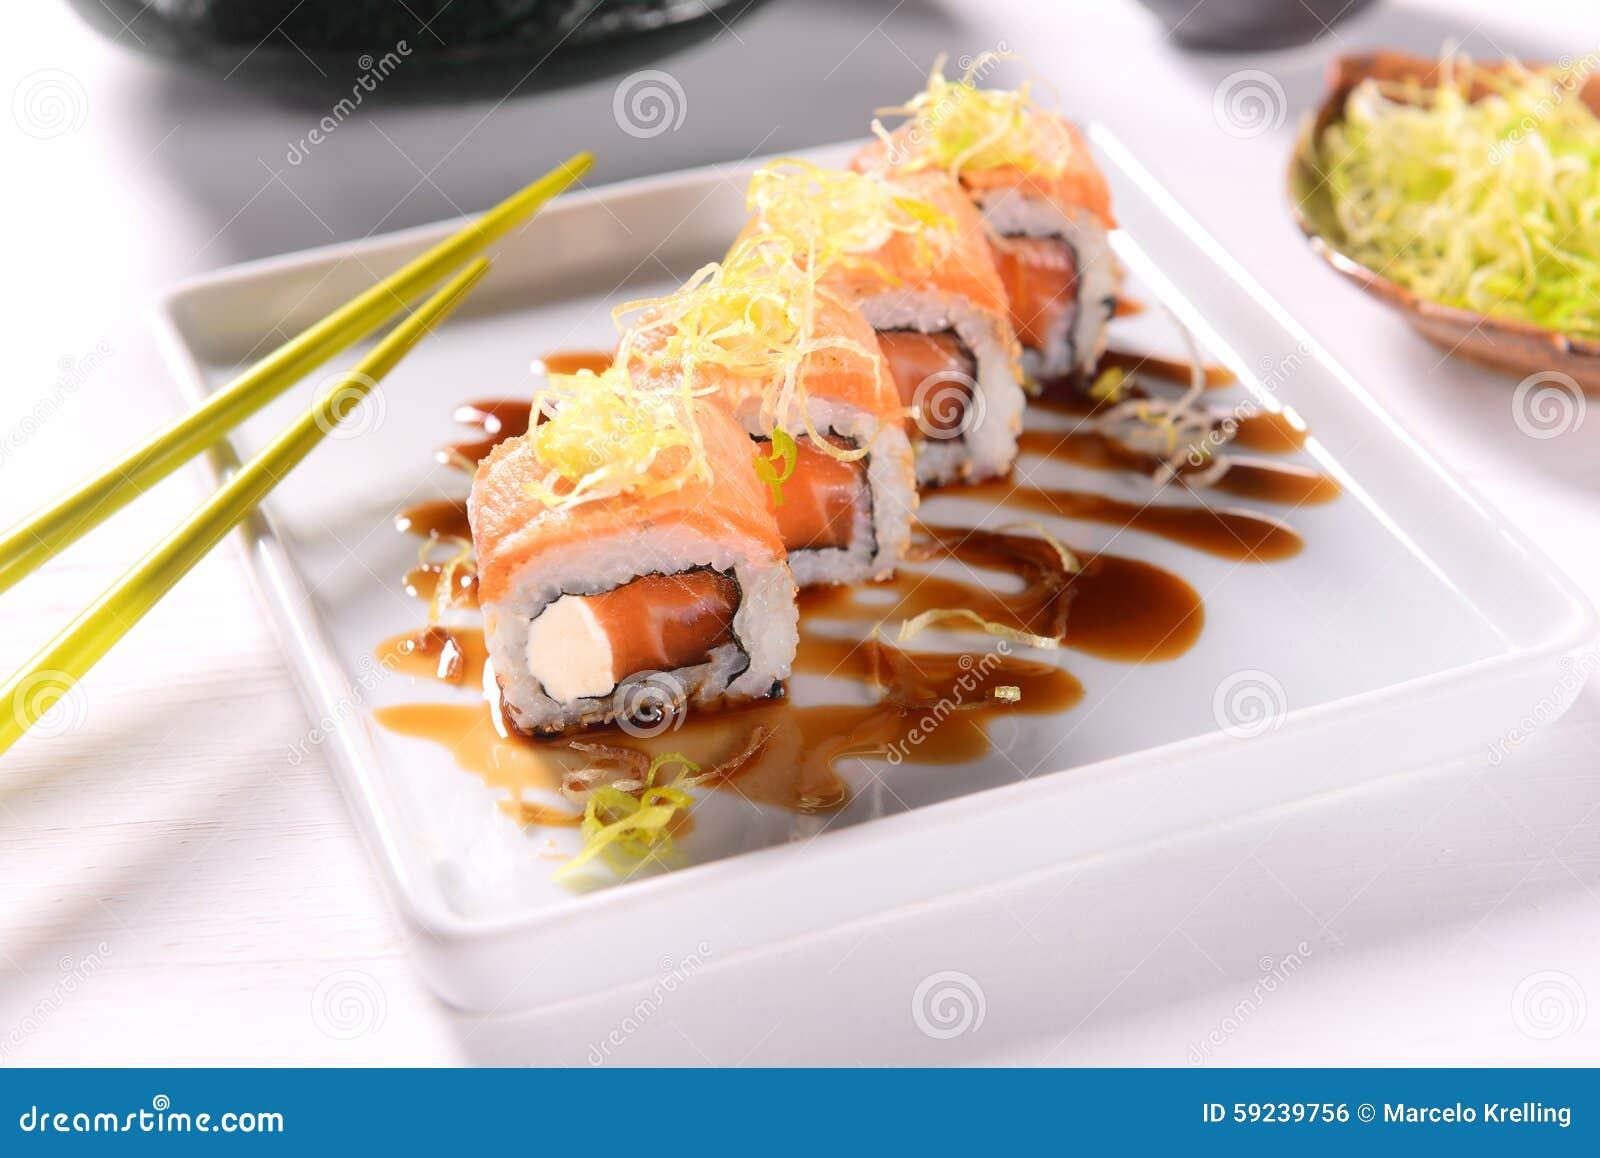 Download Sushi foto de archivo. Imagen de alimento, salsa, rodillo - 59239756